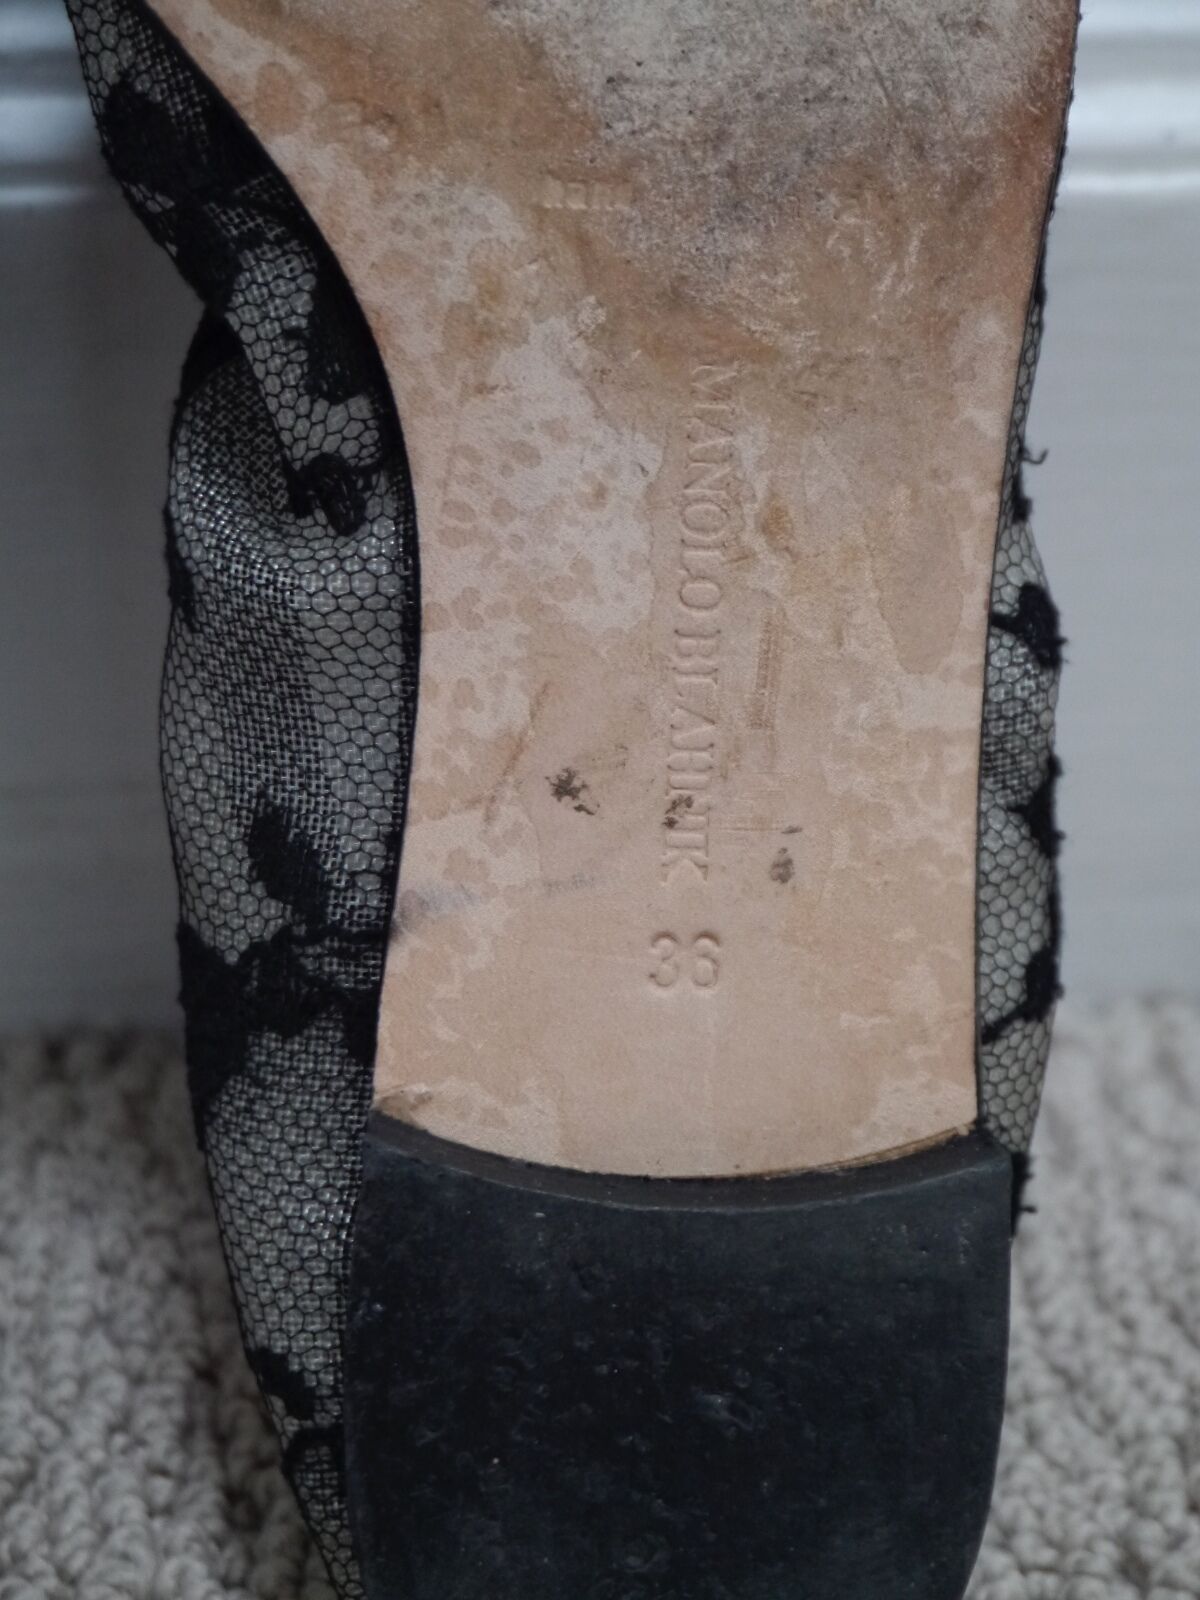 MANOLO BLAHNIK BLAHNIK BLAHNIK black lace suede trim ballet flats shoes Italian size 36 b62cb2